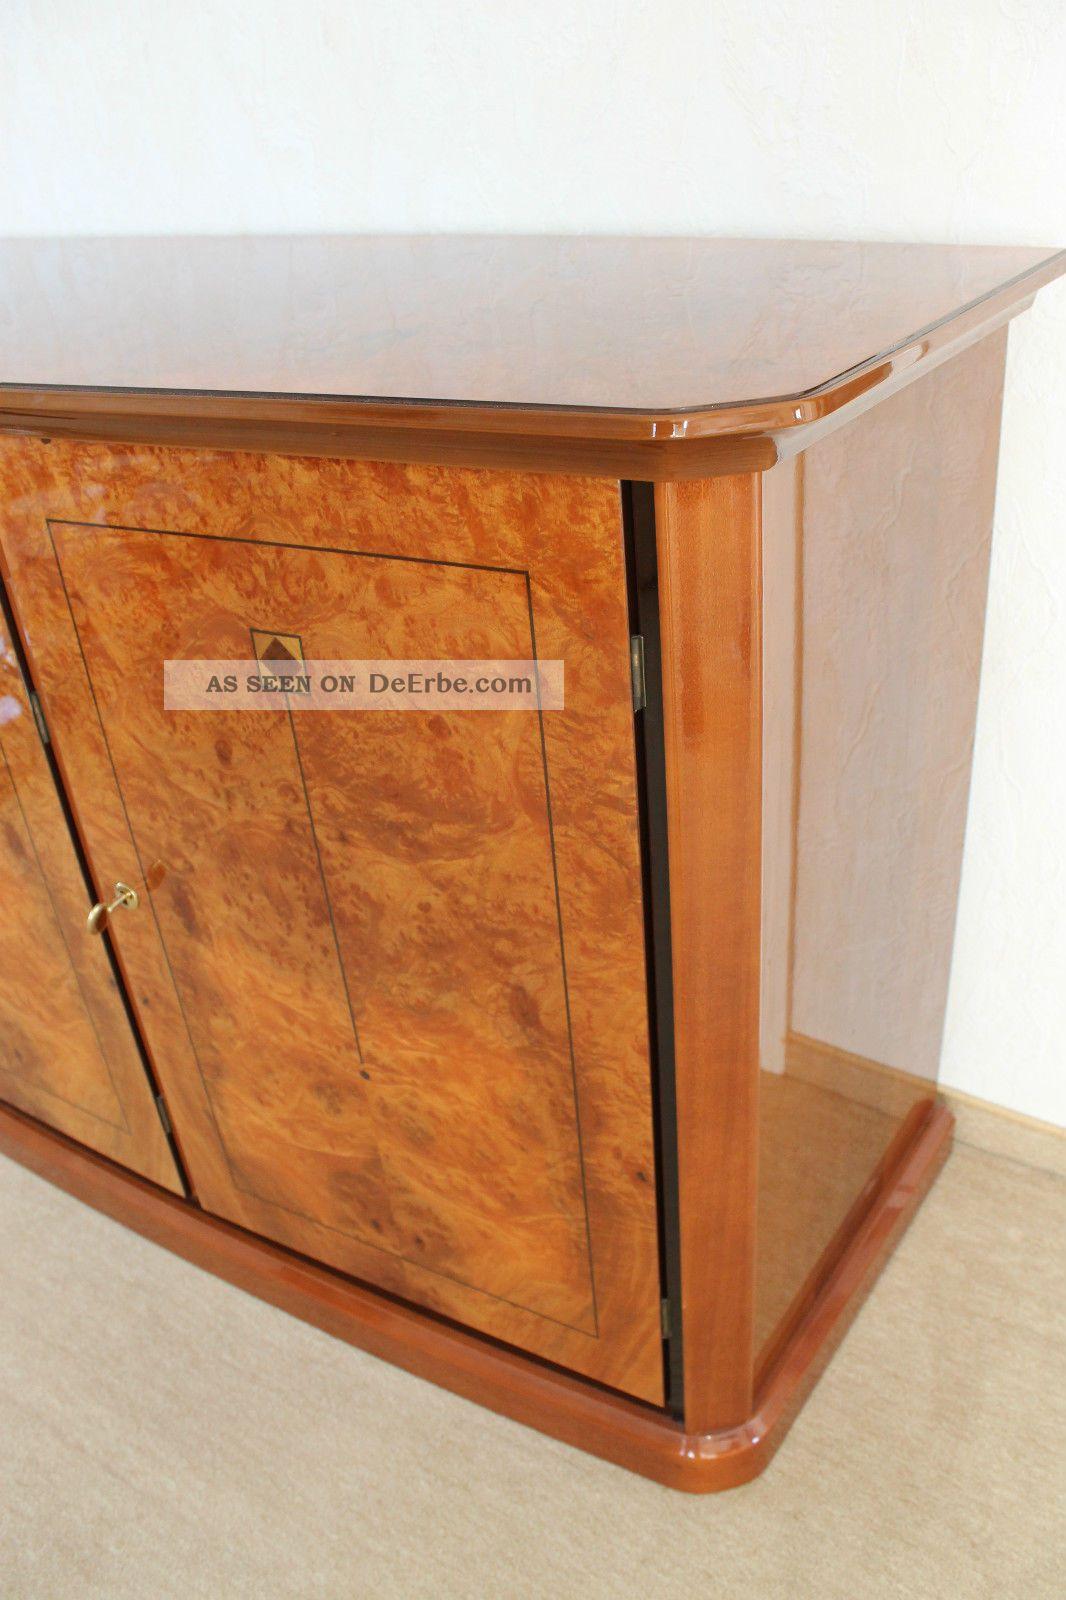 italien design kommode sideboard nu baum wurzel hochglanz intarsien schubladen. Black Bedroom Furniture Sets. Home Design Ideas